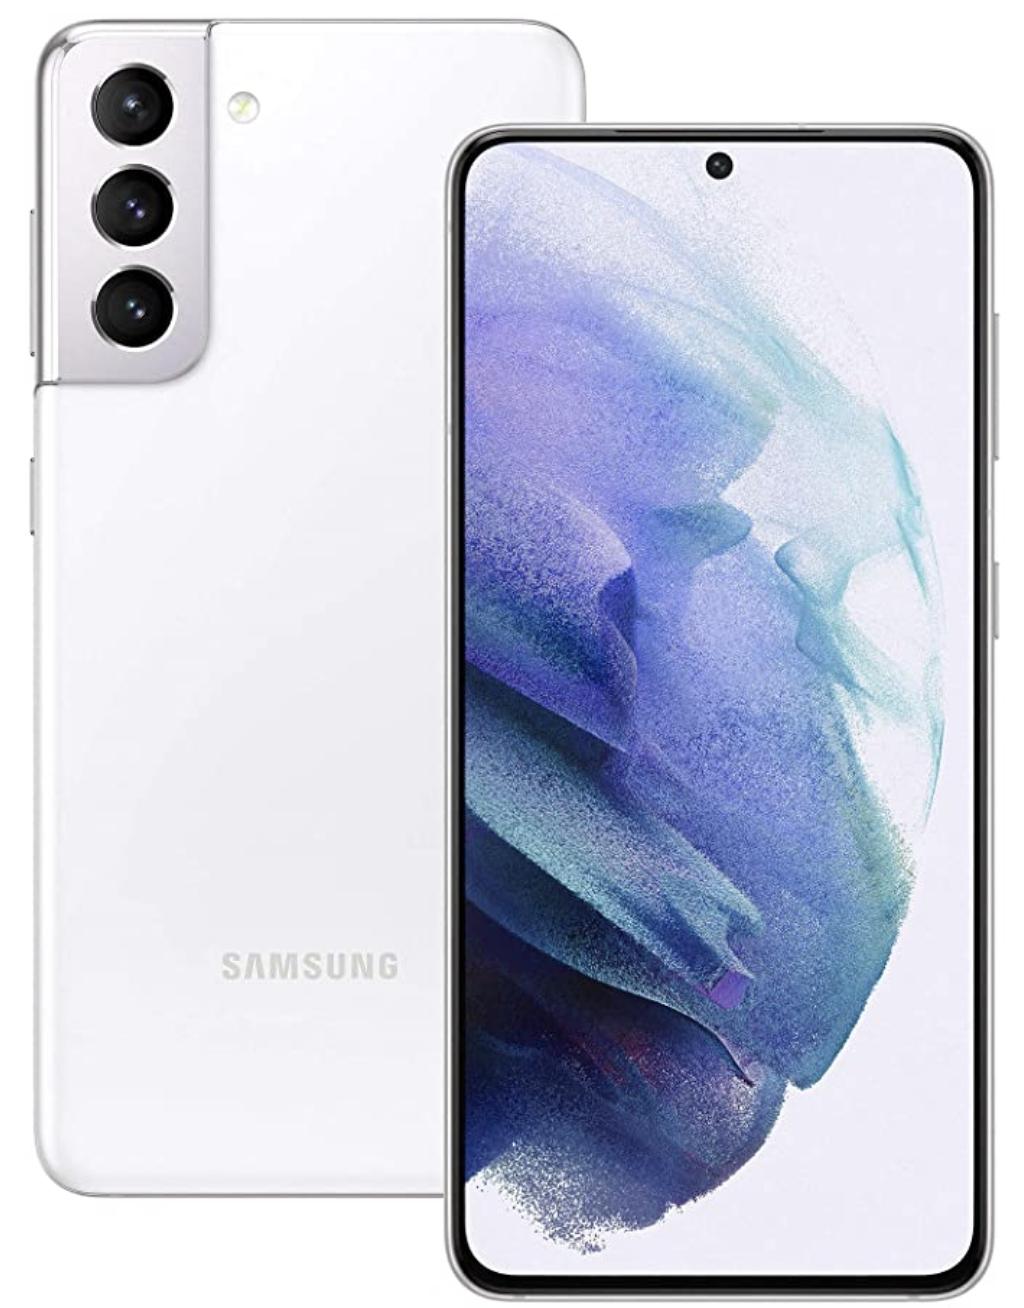 Samsung S21 128gb White + £150 Google Play Gift Card - £669.96 @ Amazon